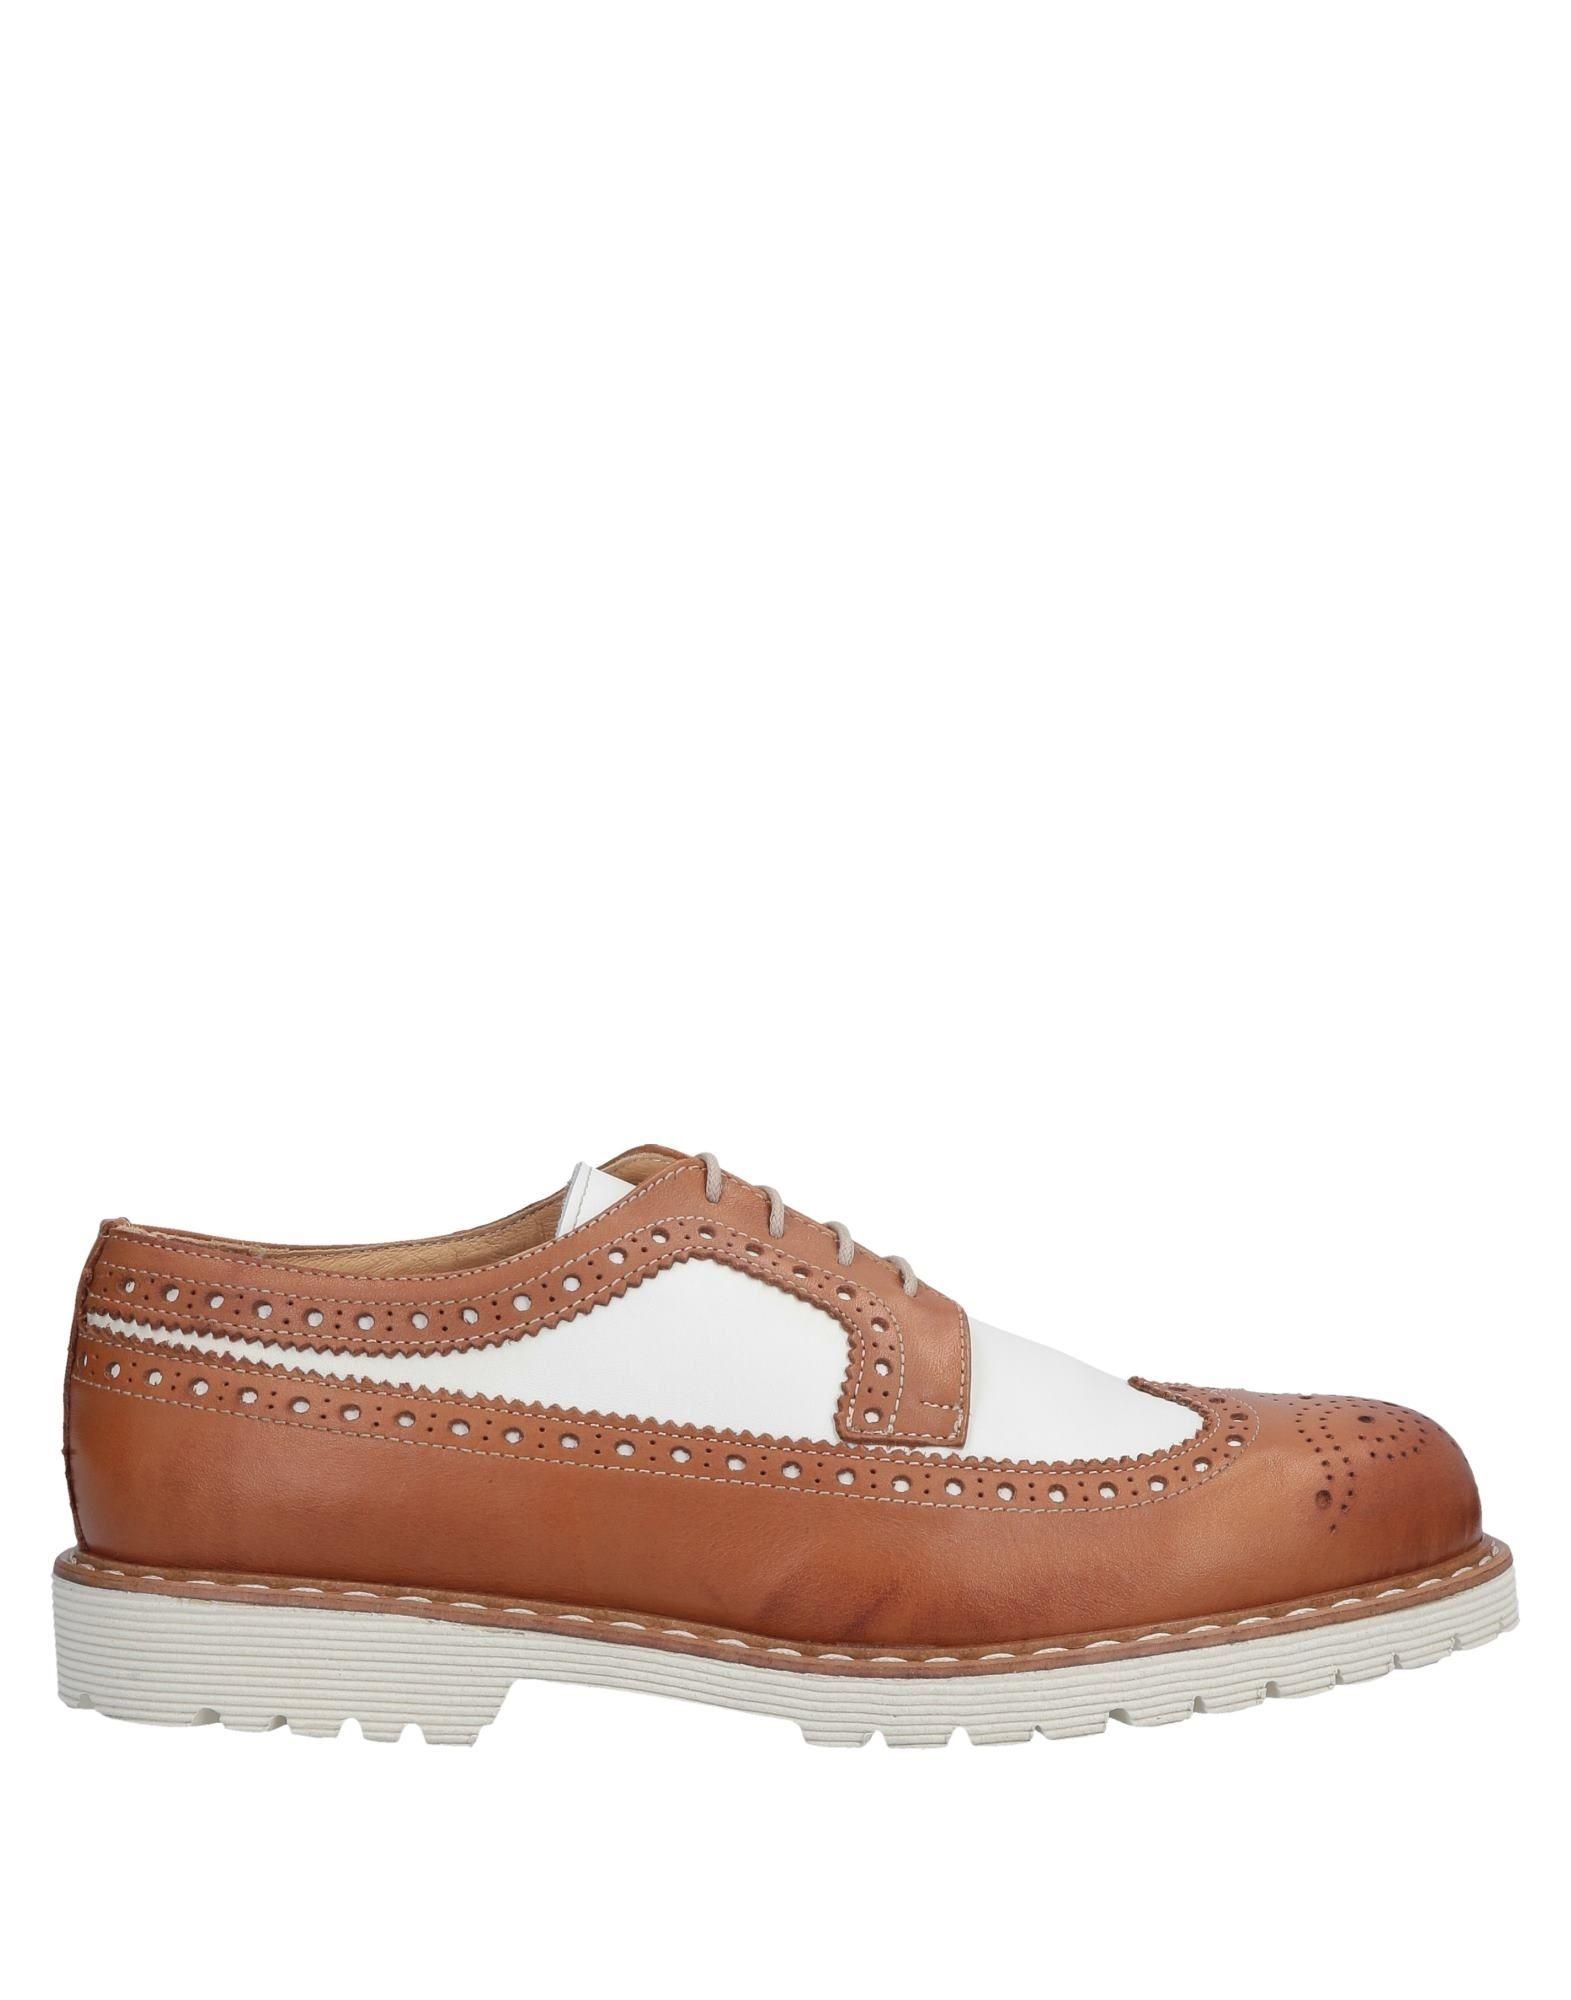 BRYAN SHOES Обувь на шнурках цены онлайн